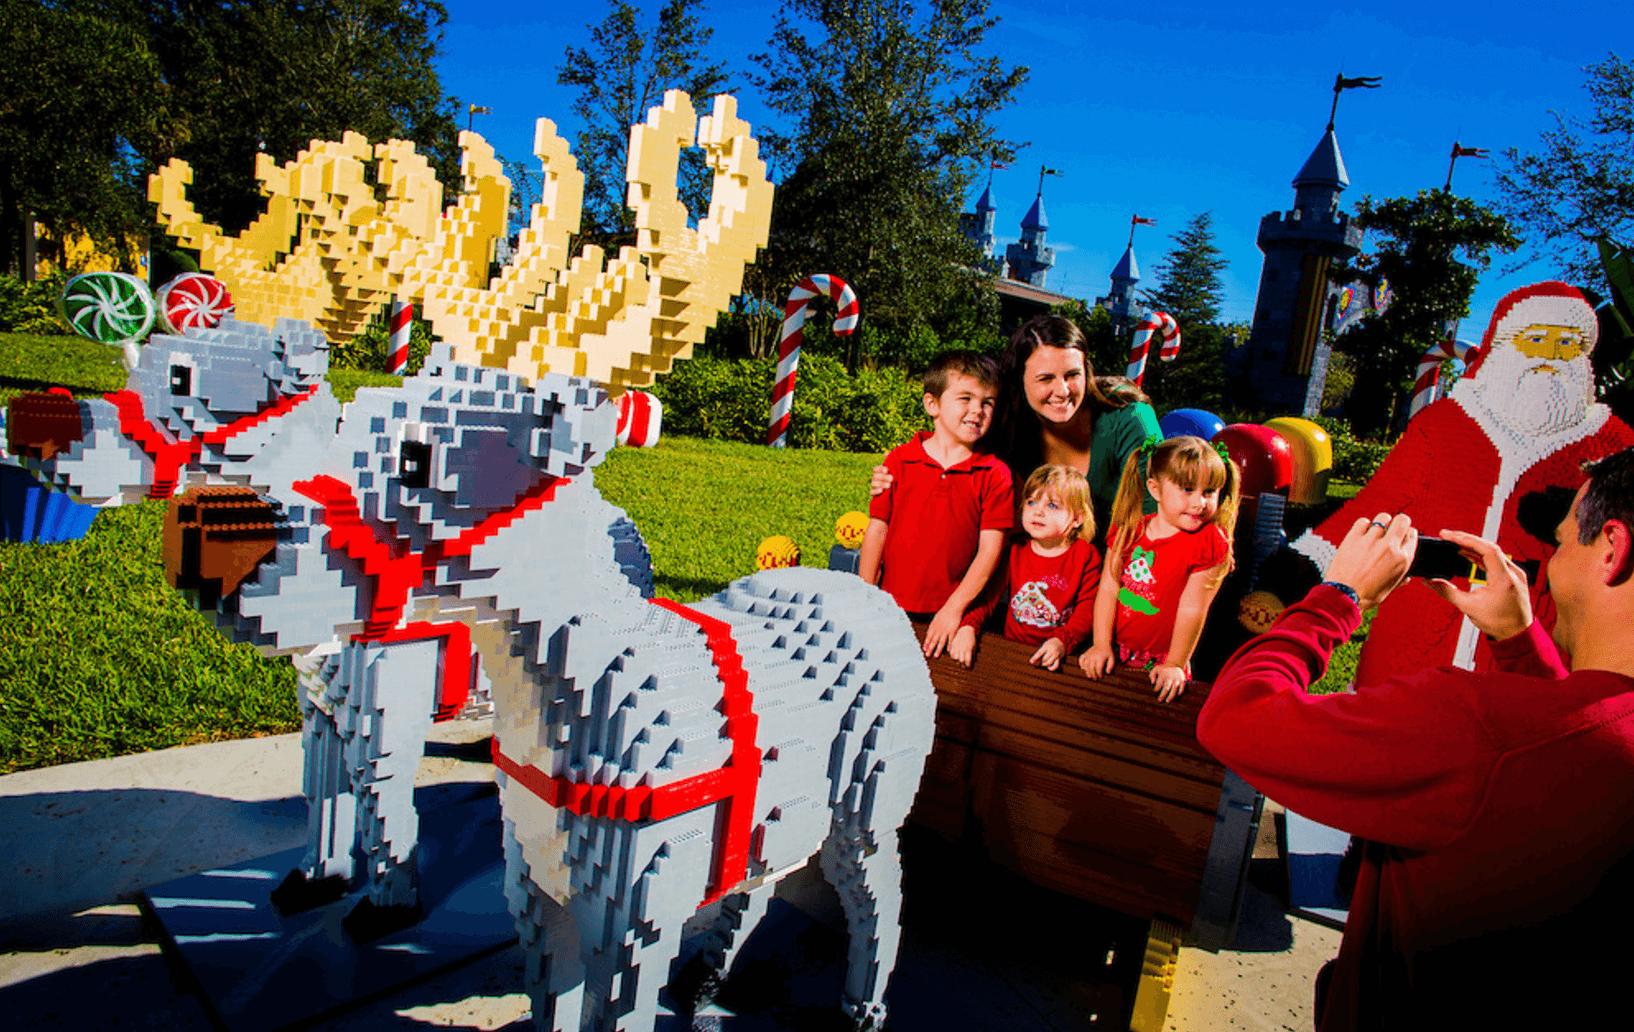 Christmas Bricktacular seasonal celebration begins at LEGOLAND ...